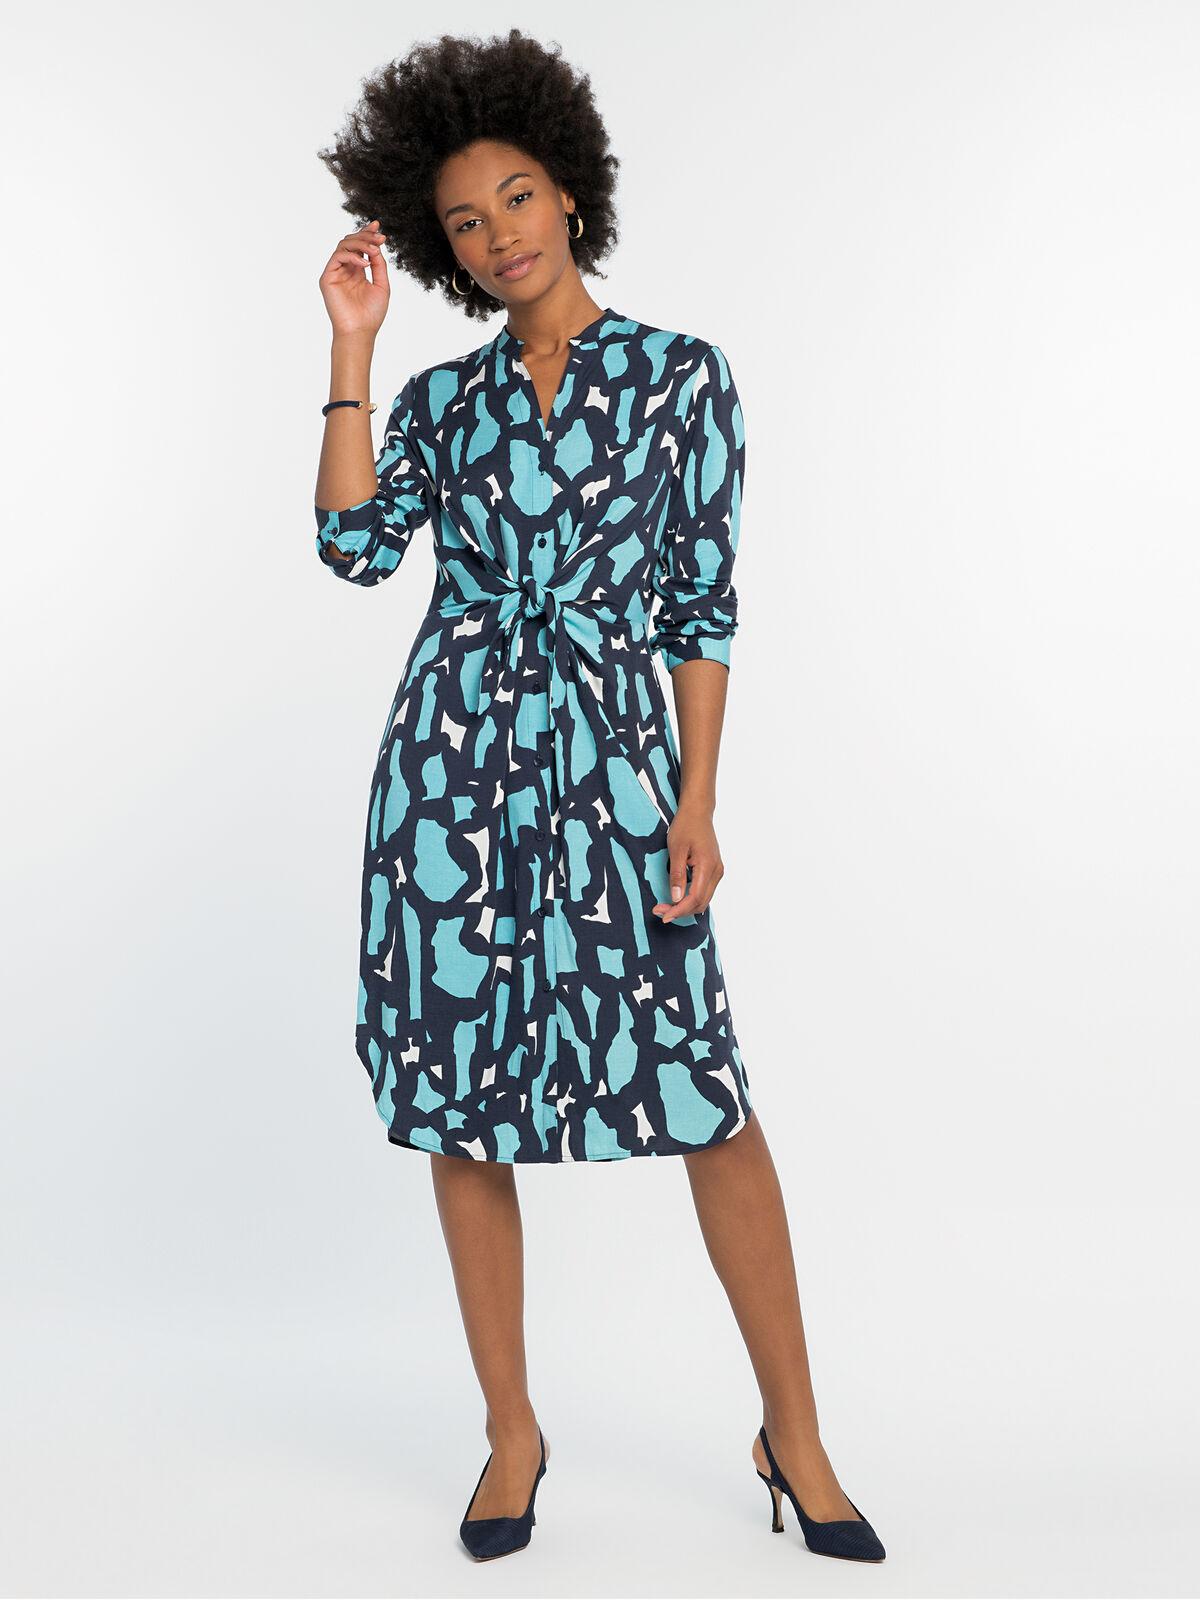 VIVID GIRAFFE TIE DRESS